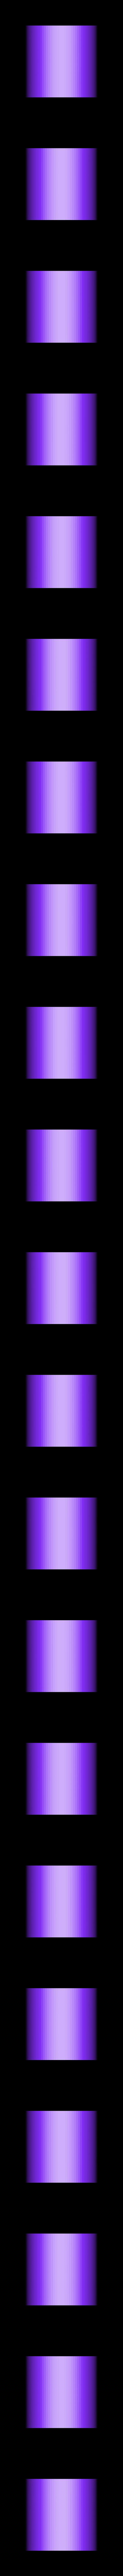 Bunn_fixed.stl Download free STL file Piranha plant switch game holder • Model to 3D print, Gunnarf1986